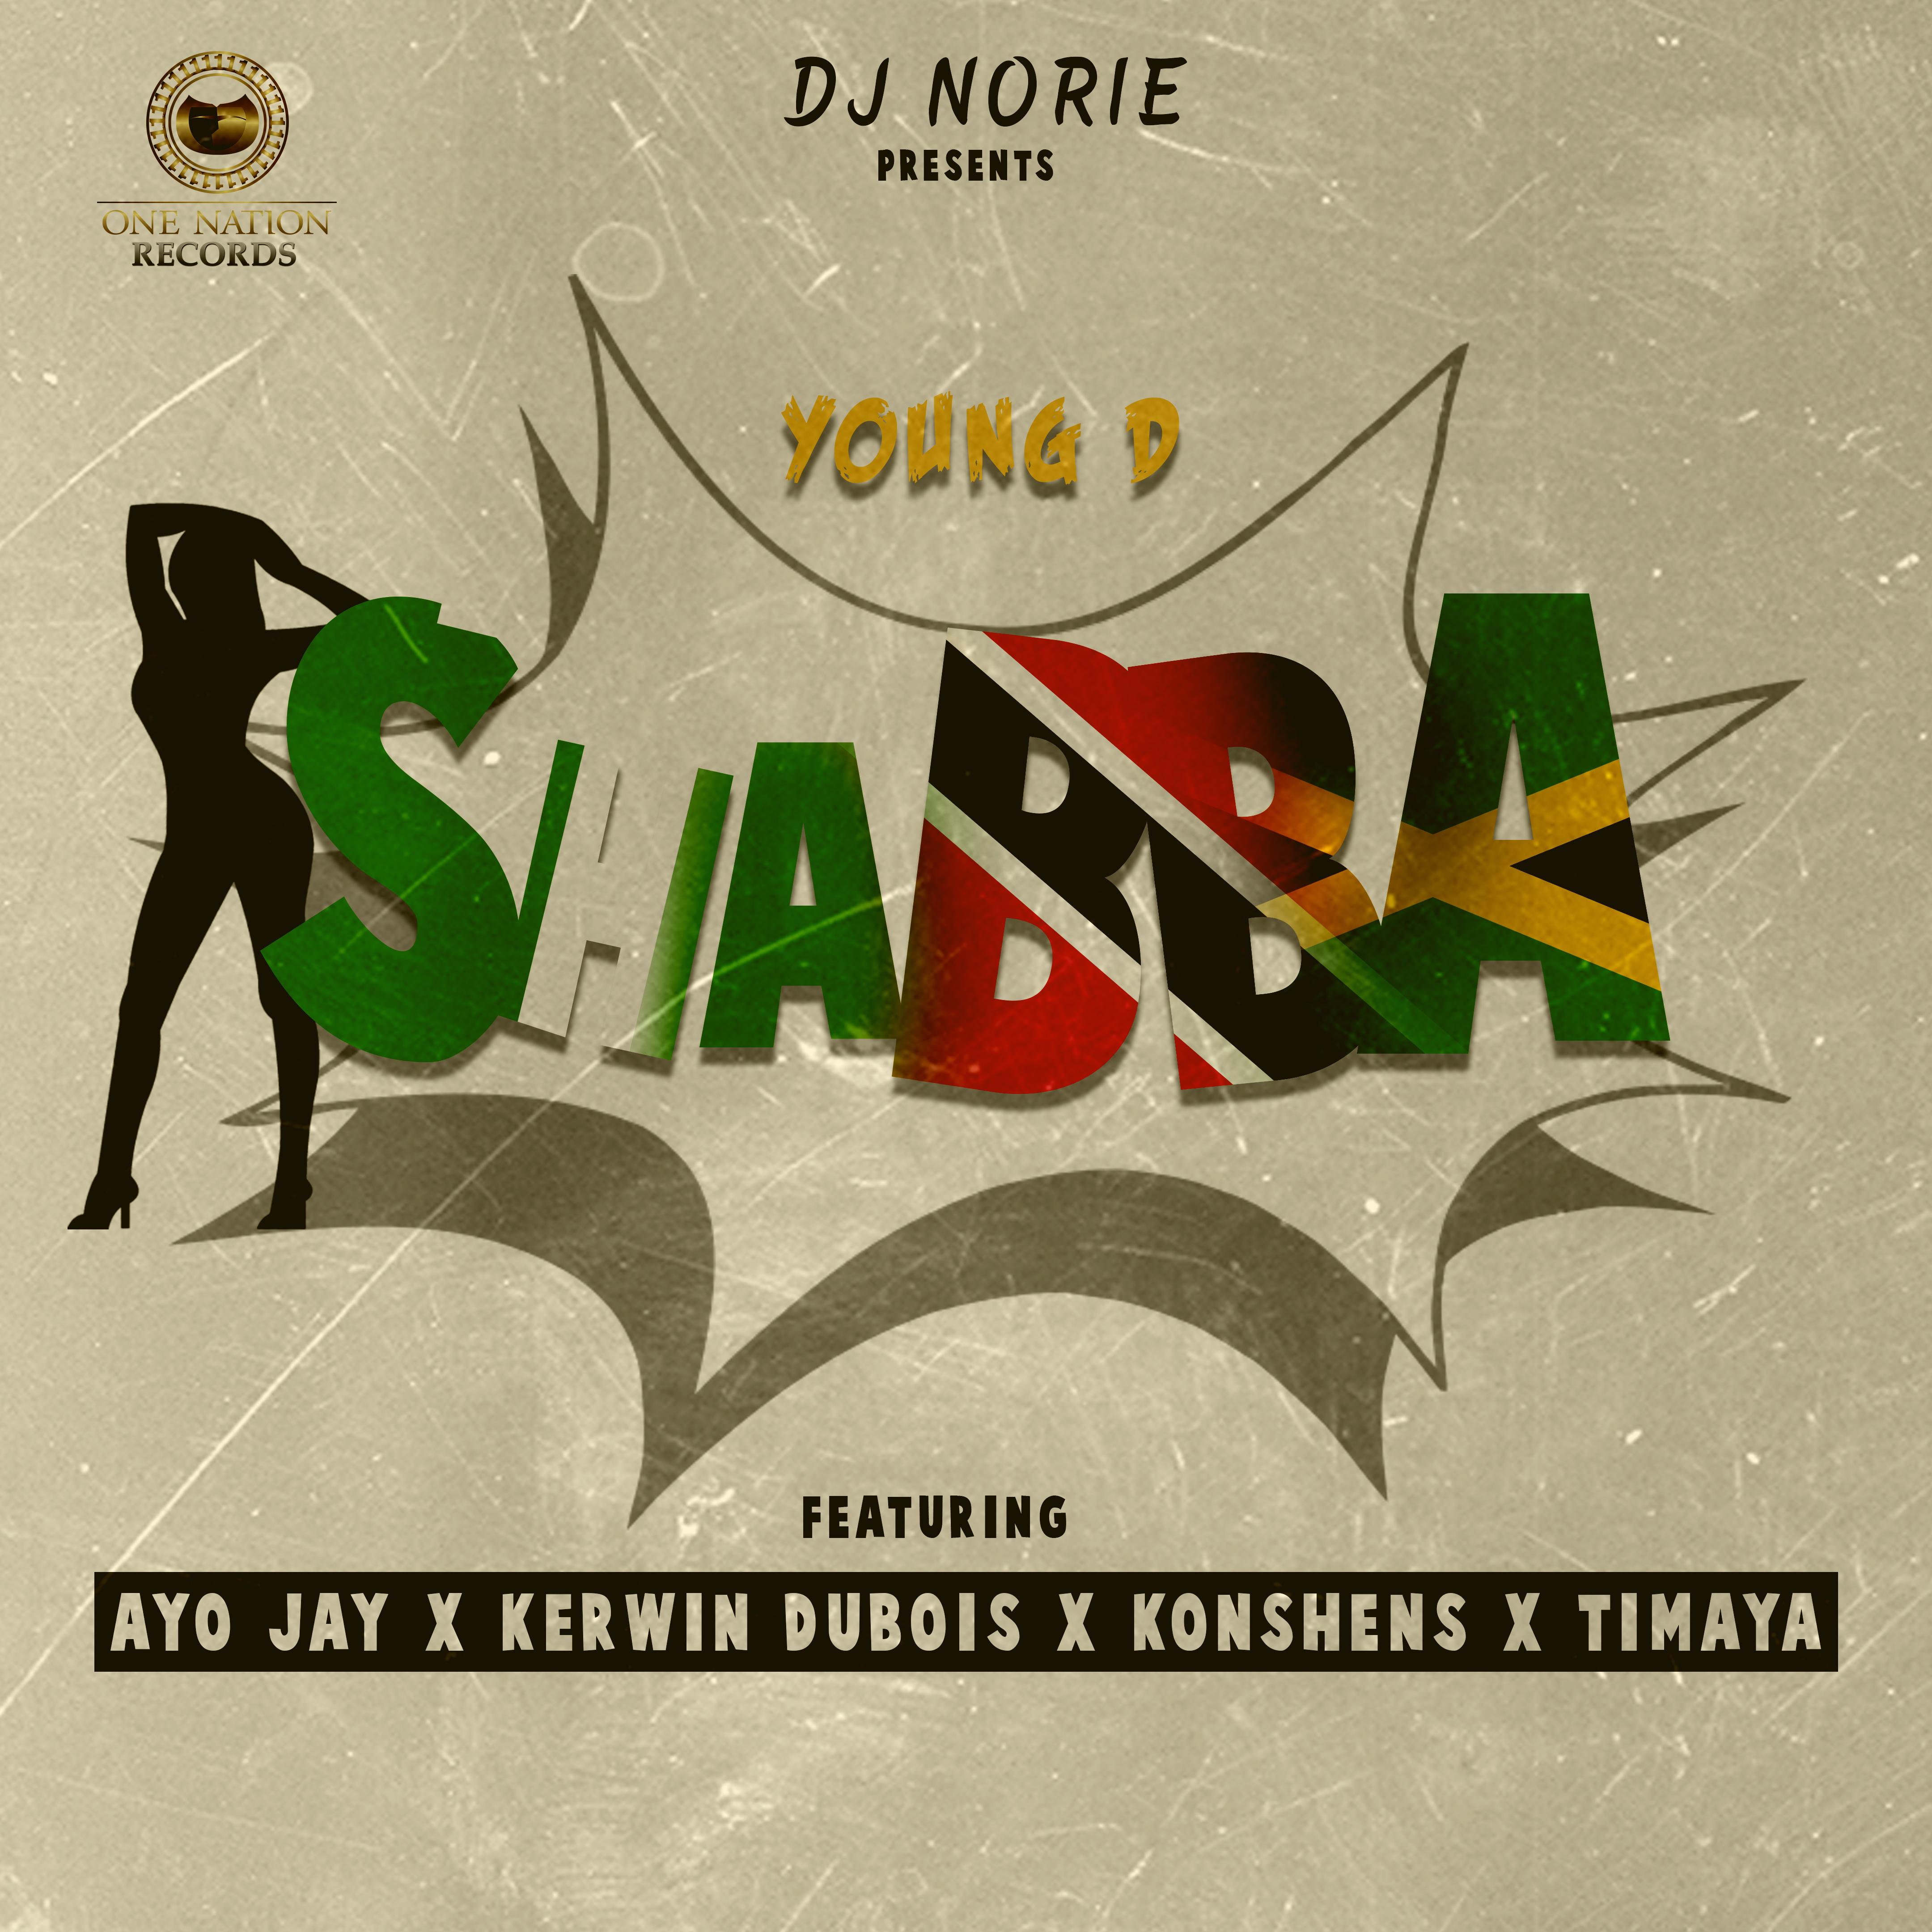 DJ Norie Presents: Young D - Shabba ft. Ayo Jay x Kerwin Dubois x Konshens x Timaya 3